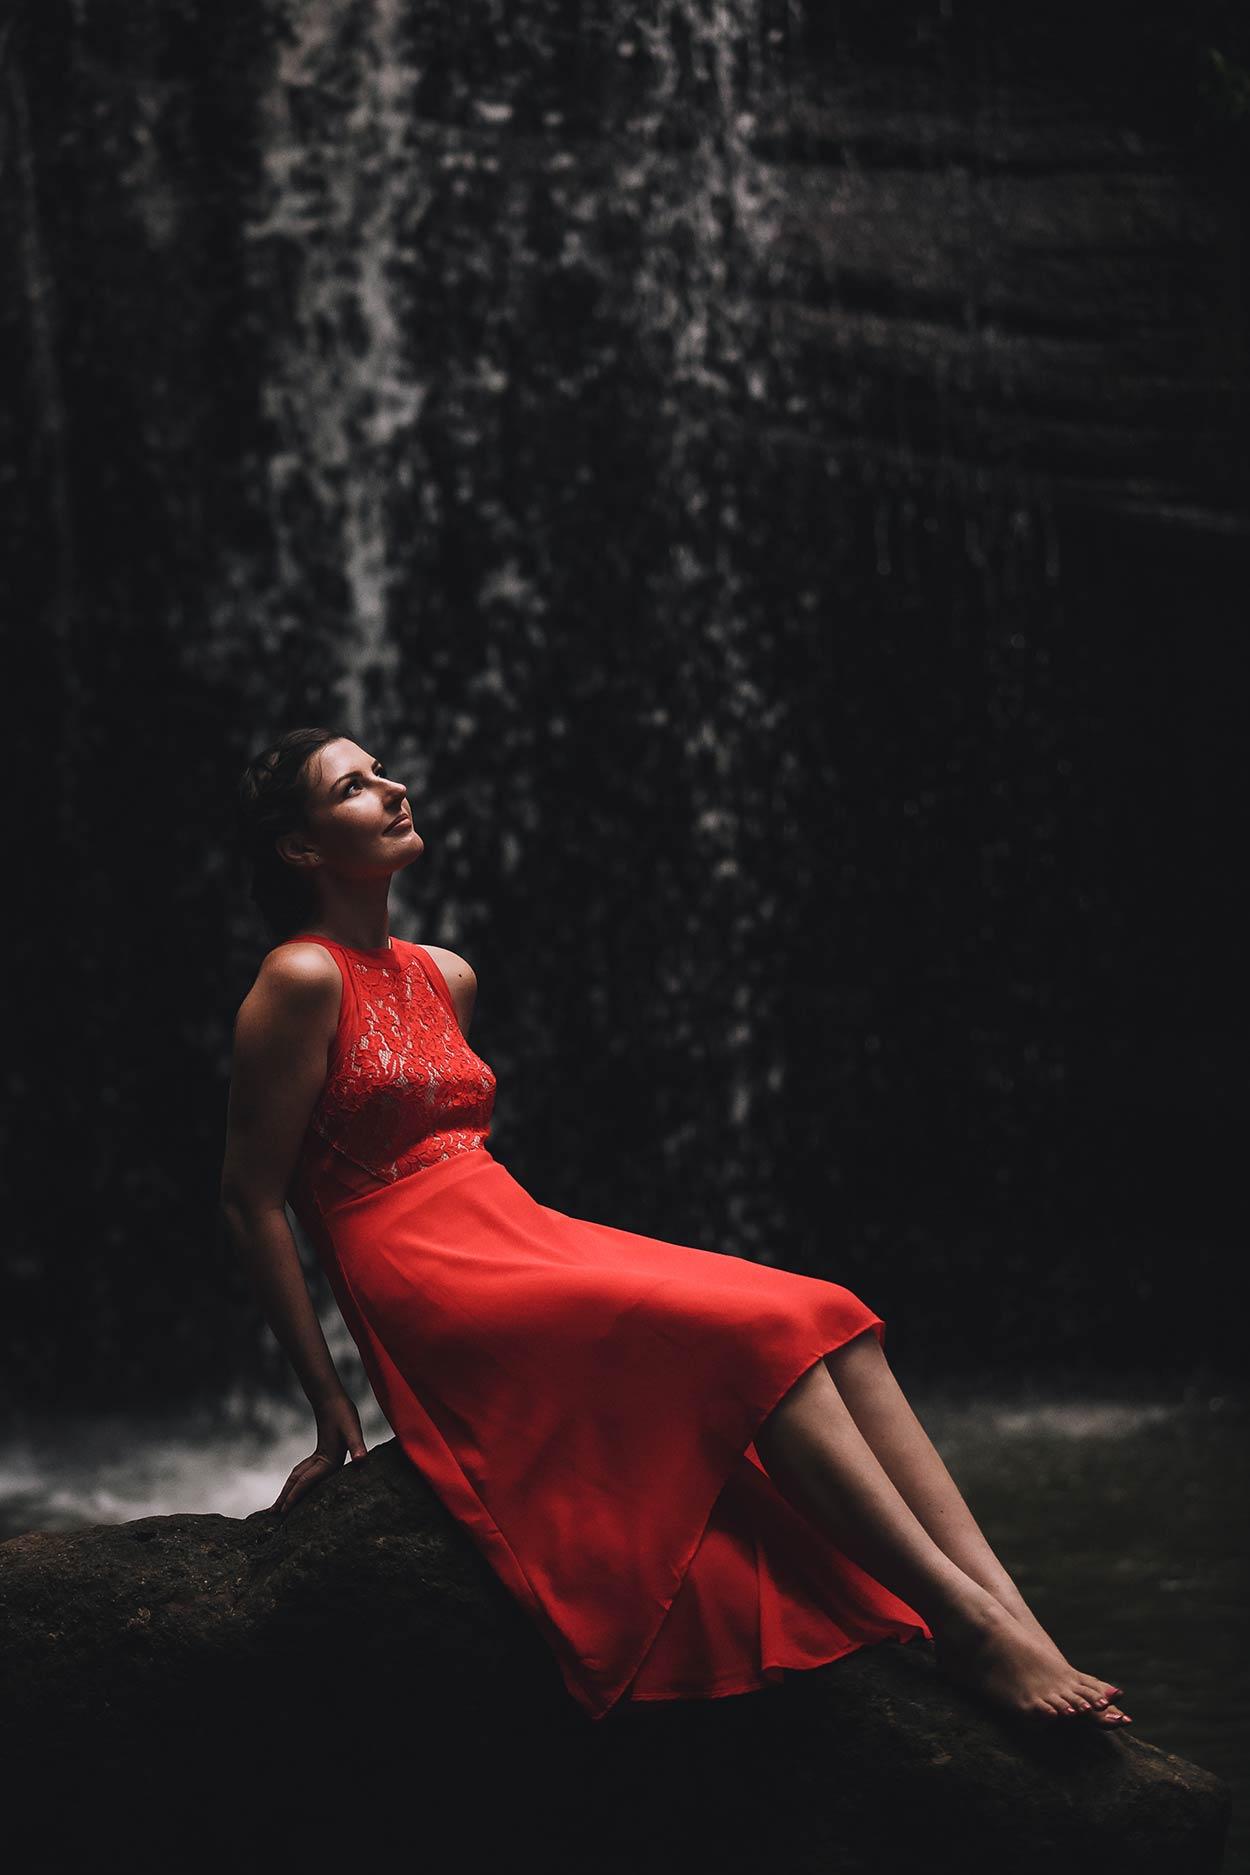 Caloundra & Noosa Waterfall Wedding Photographer - Sunshine Coast, Queensland, Australian Photographers